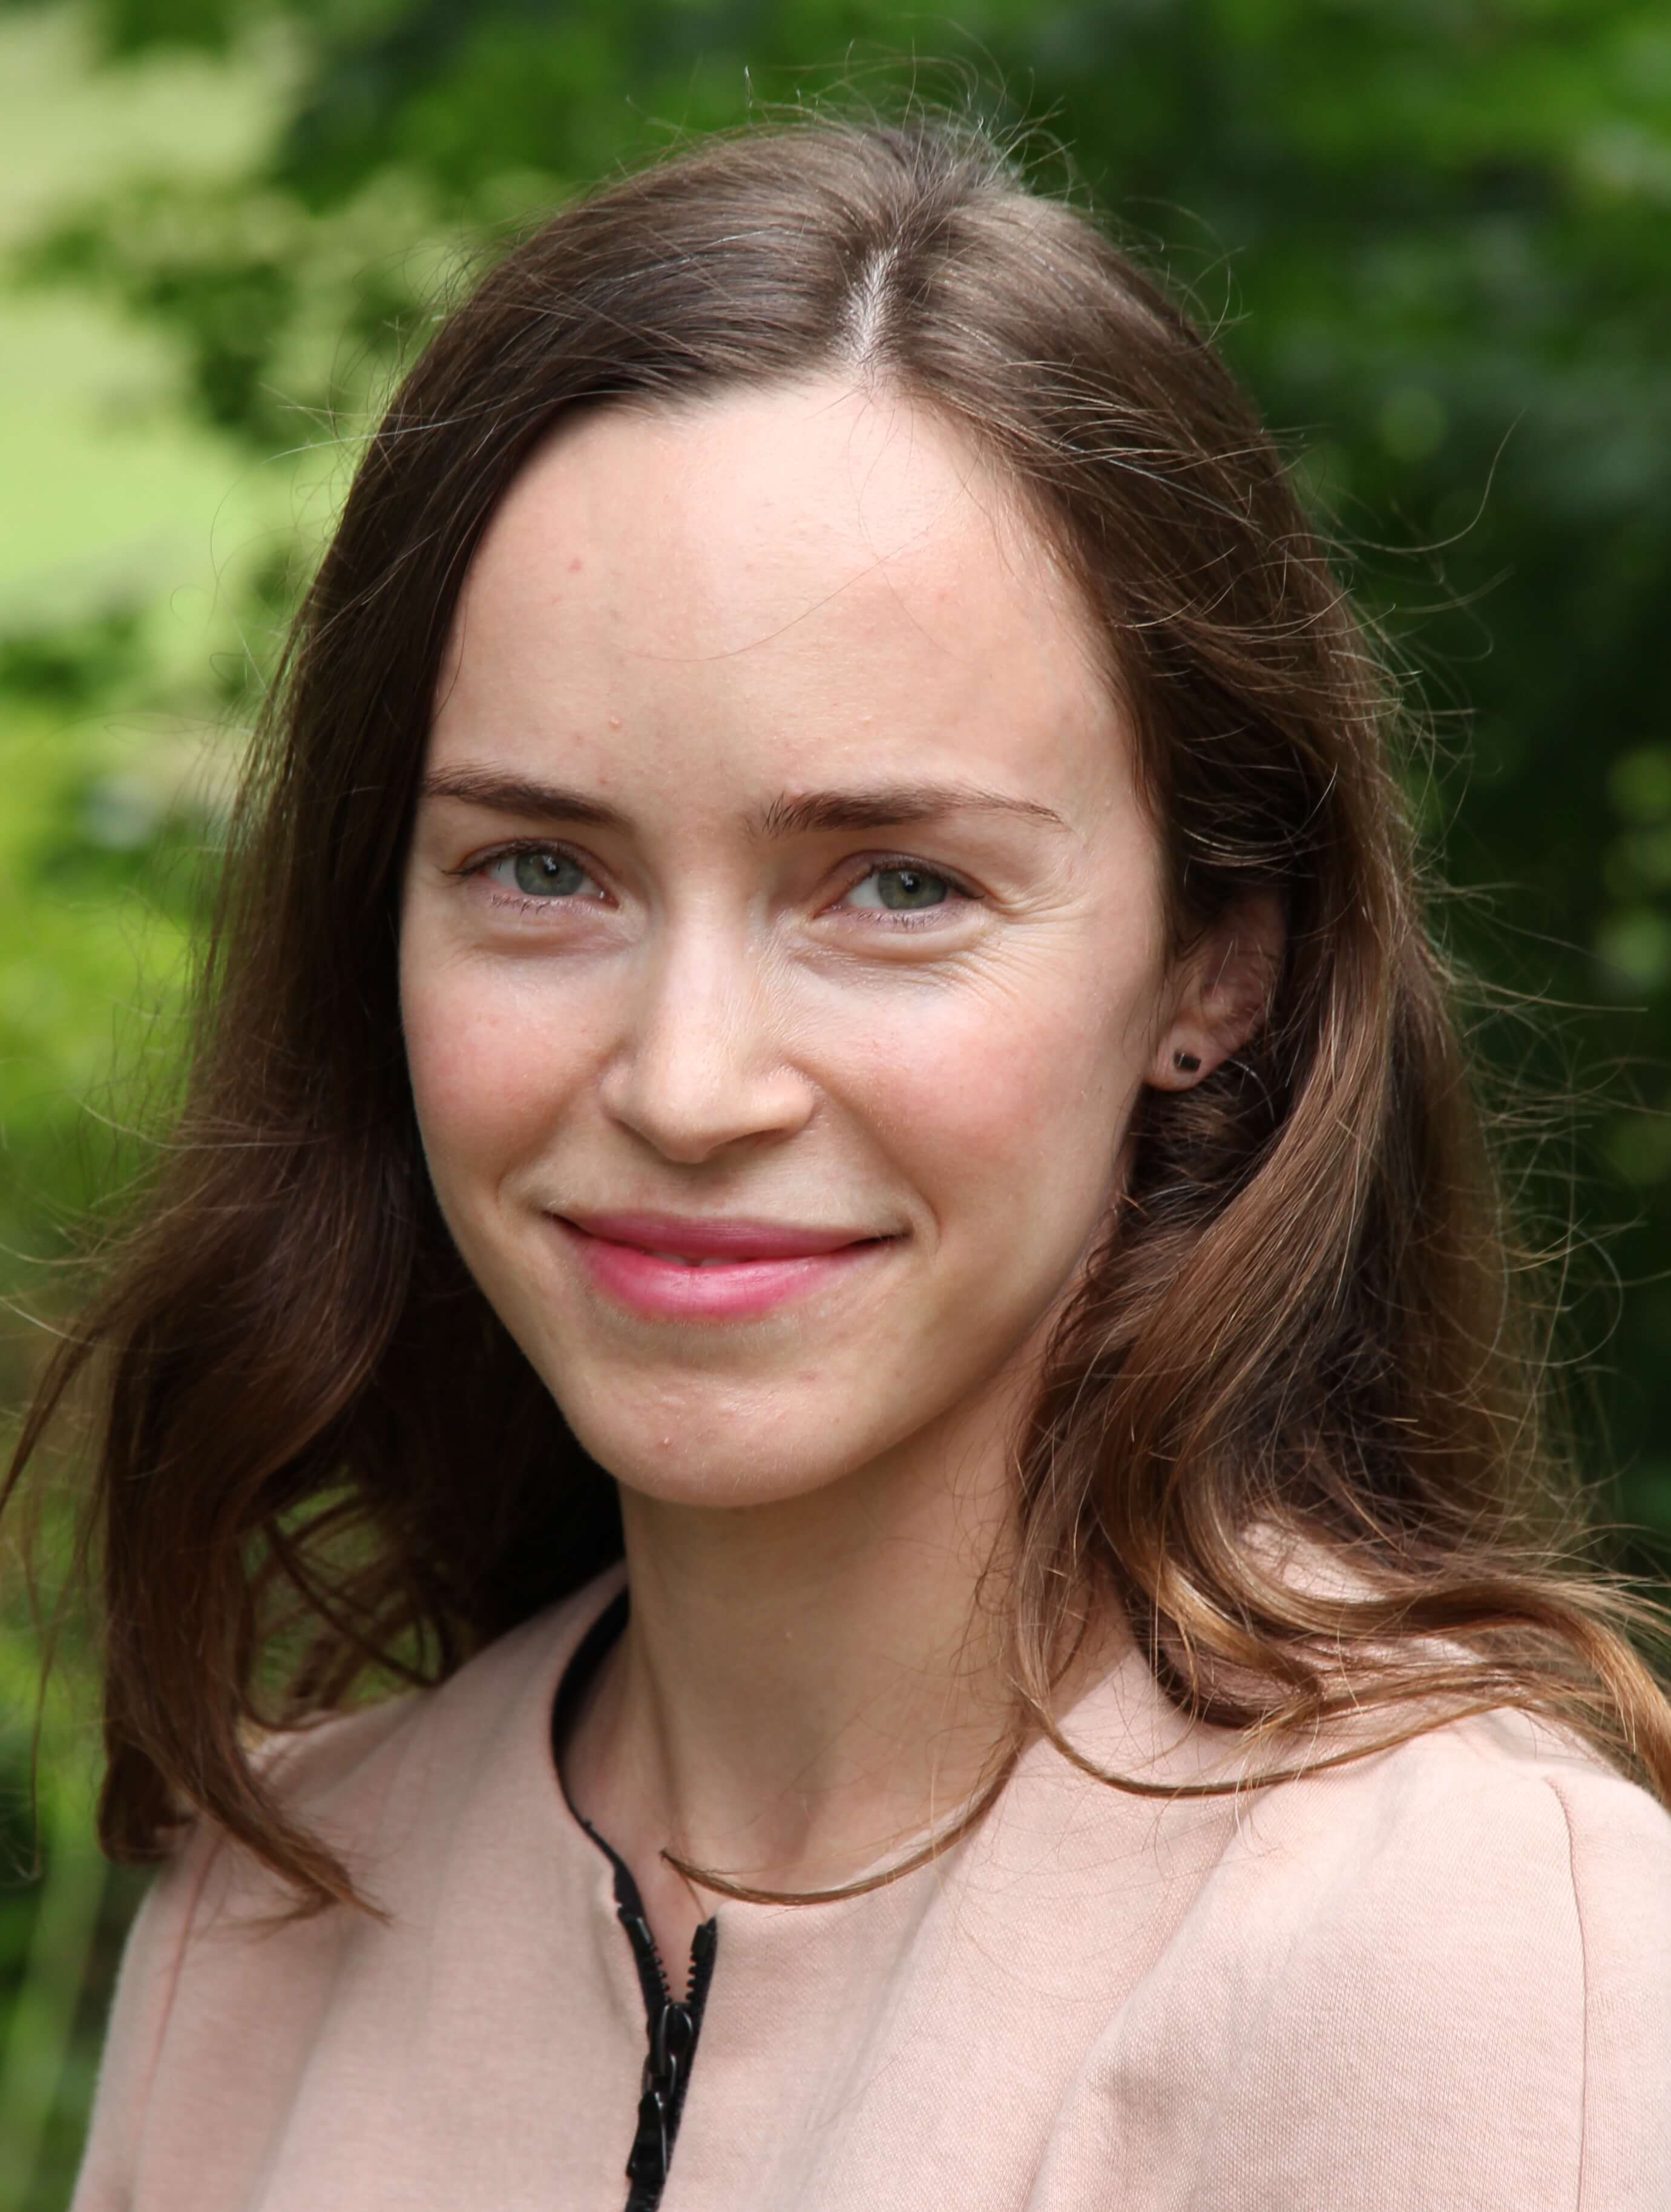 Photo of Laura E. Turner, Ph.D.